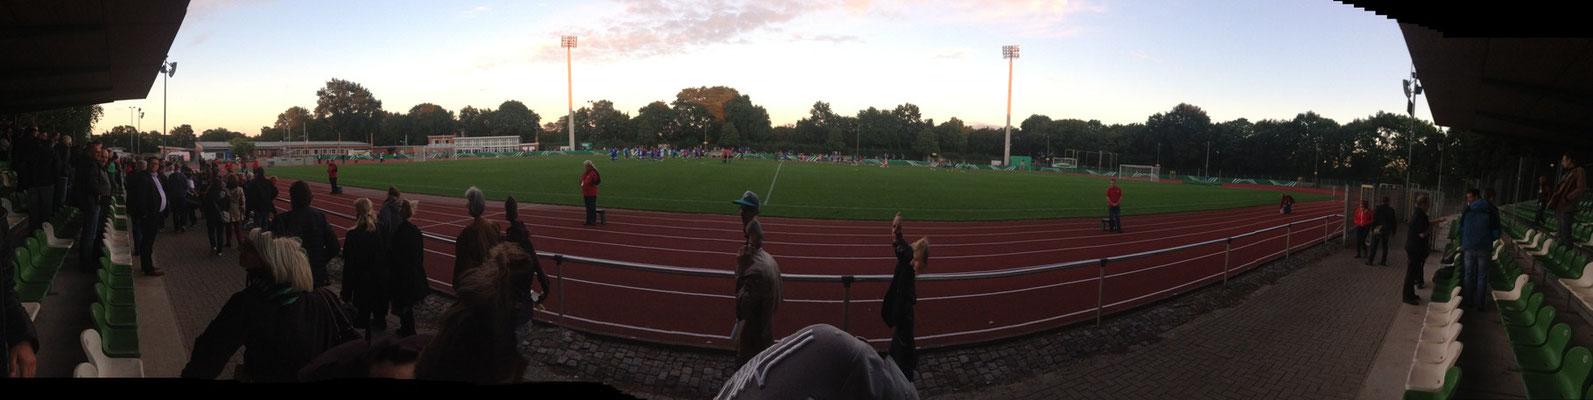 VIP/ Presse Bereich. Foto: Fabian Köster.